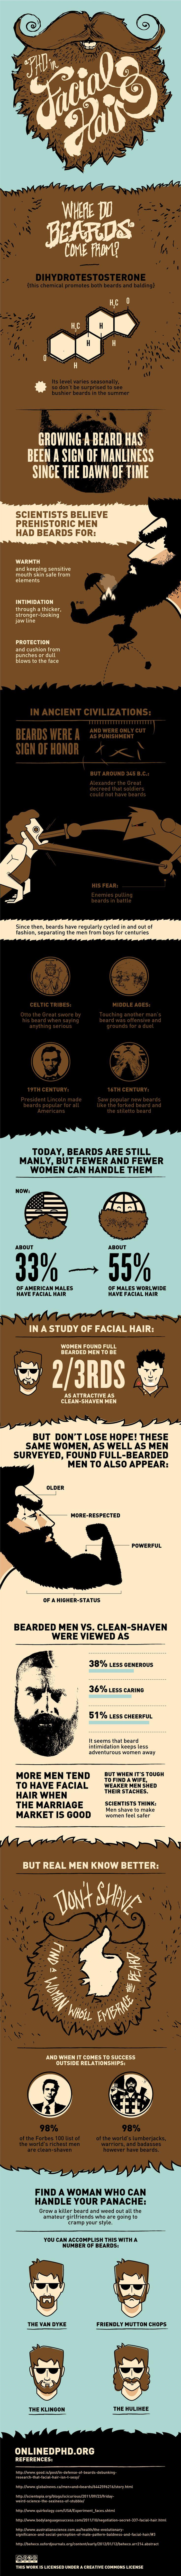 The Amazing History of Beards